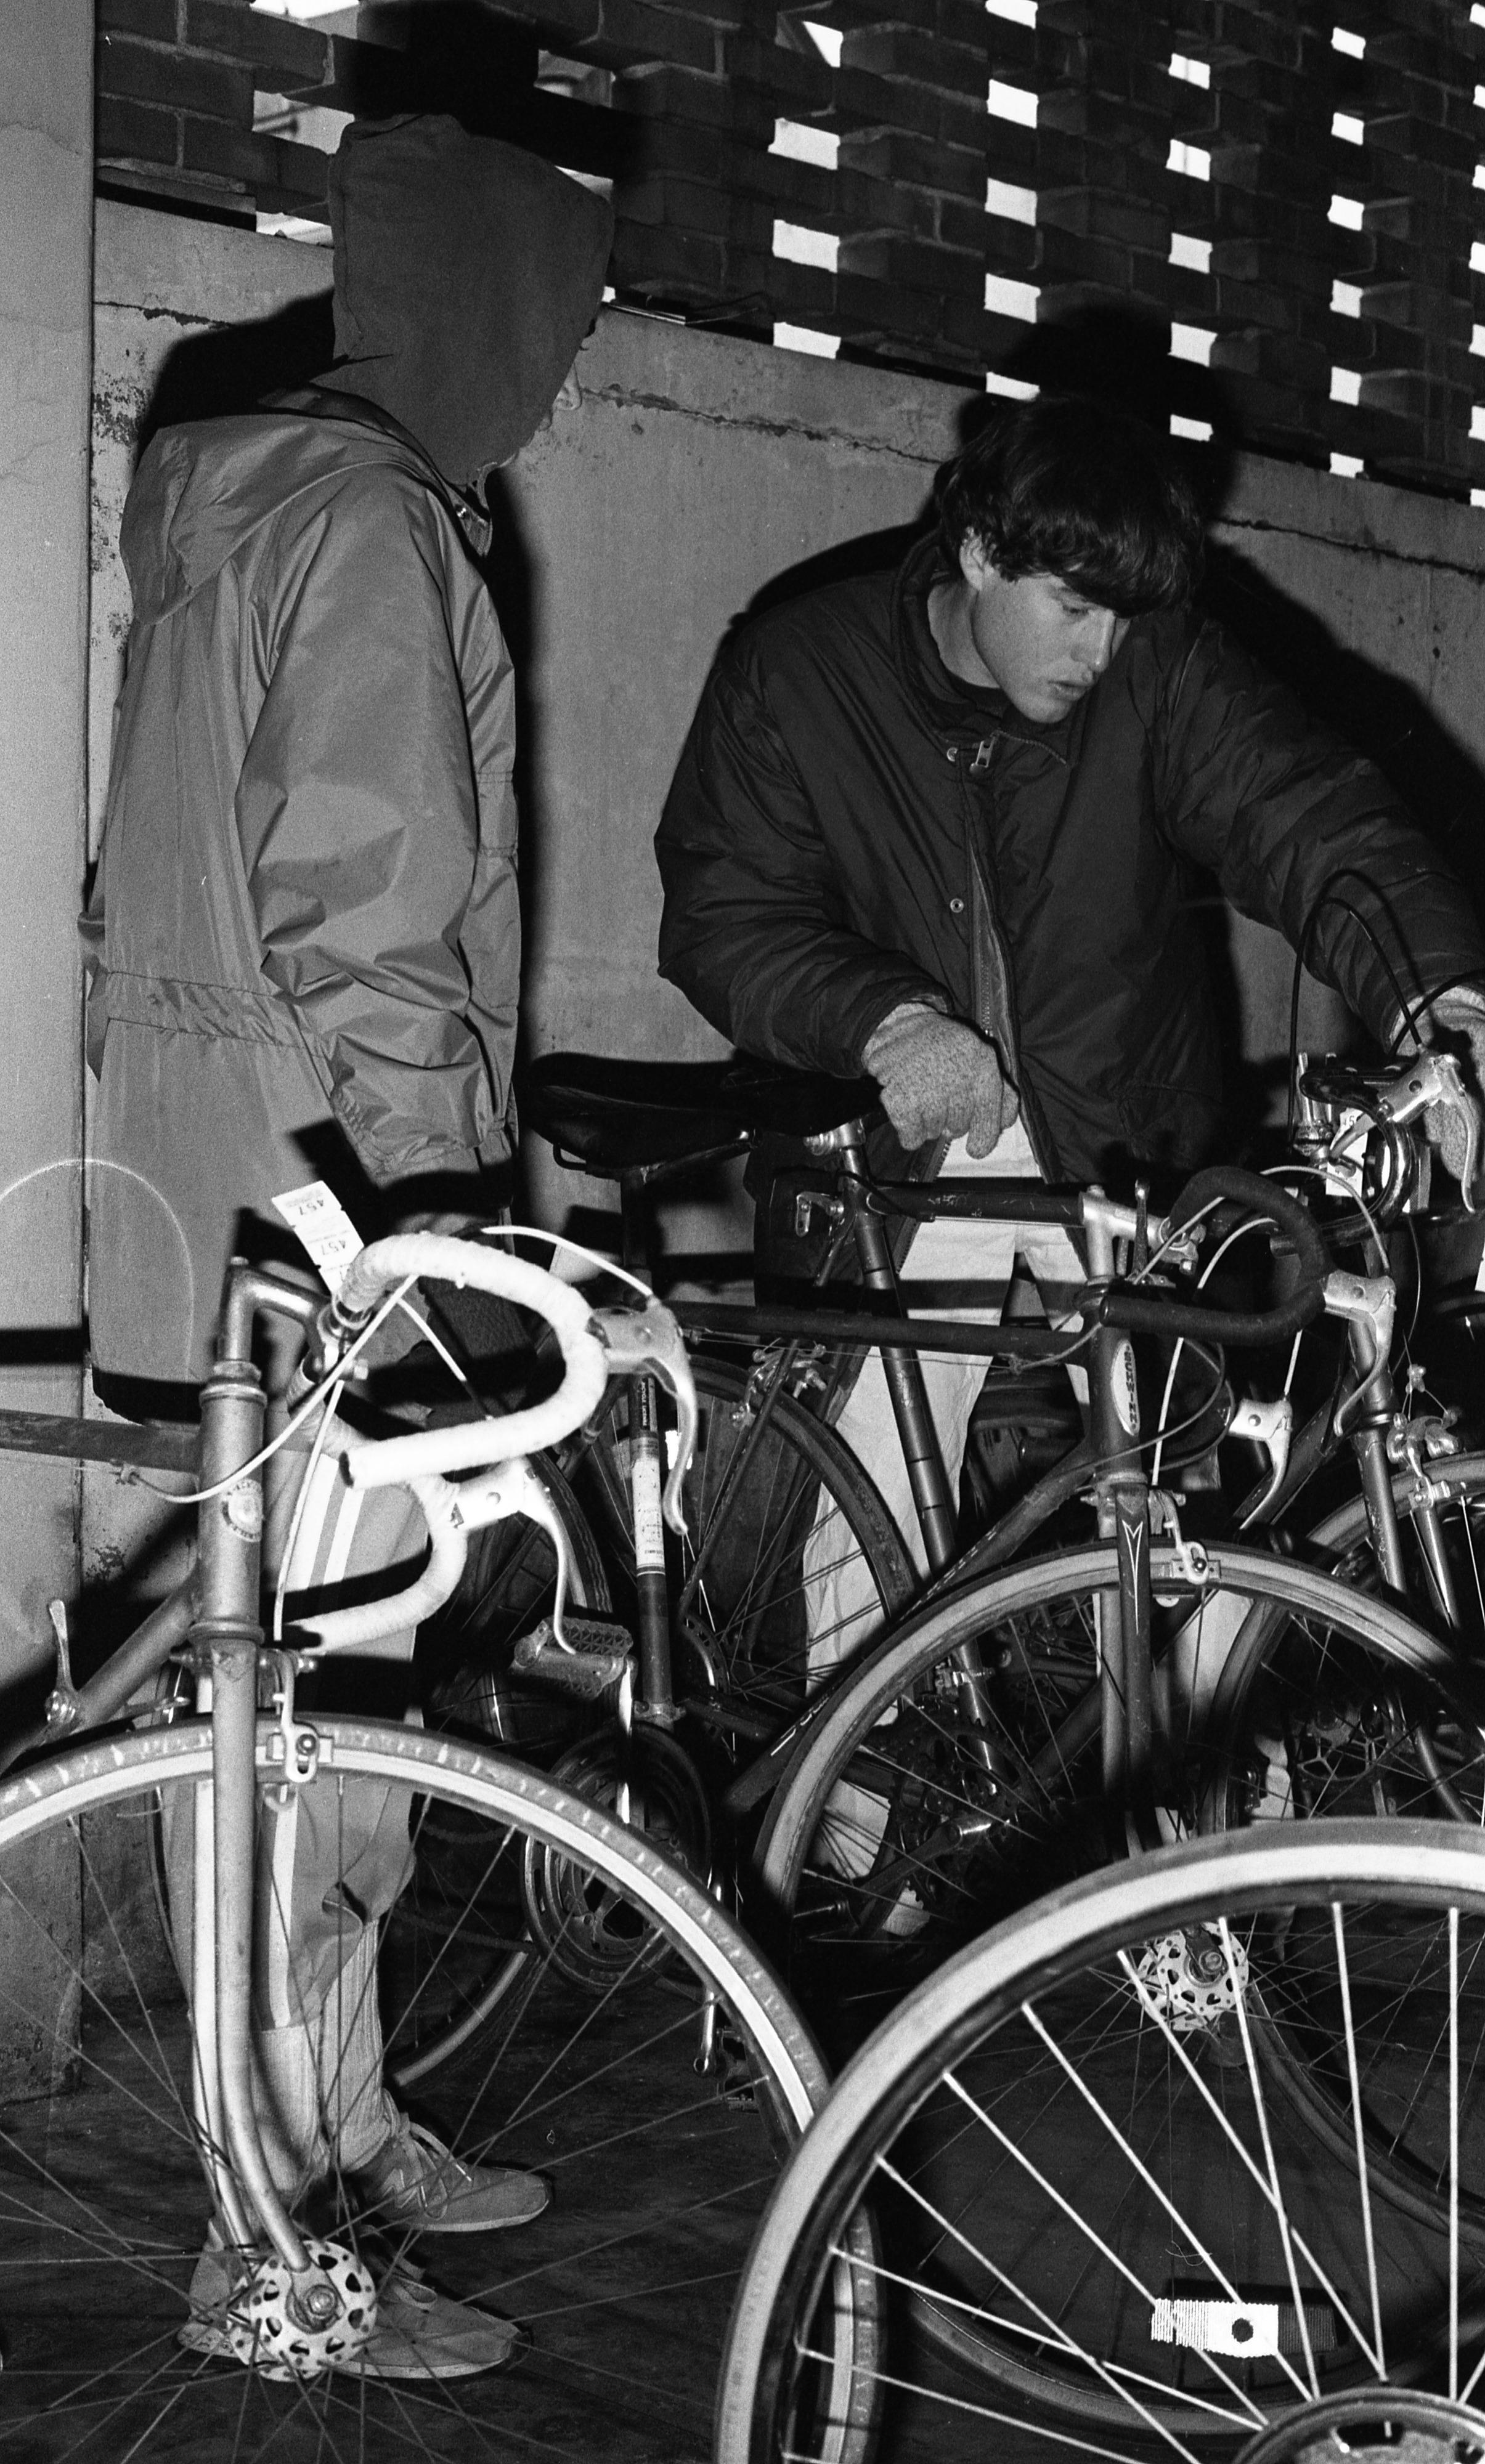 Ann Arbor Police Bike Auction March 1982